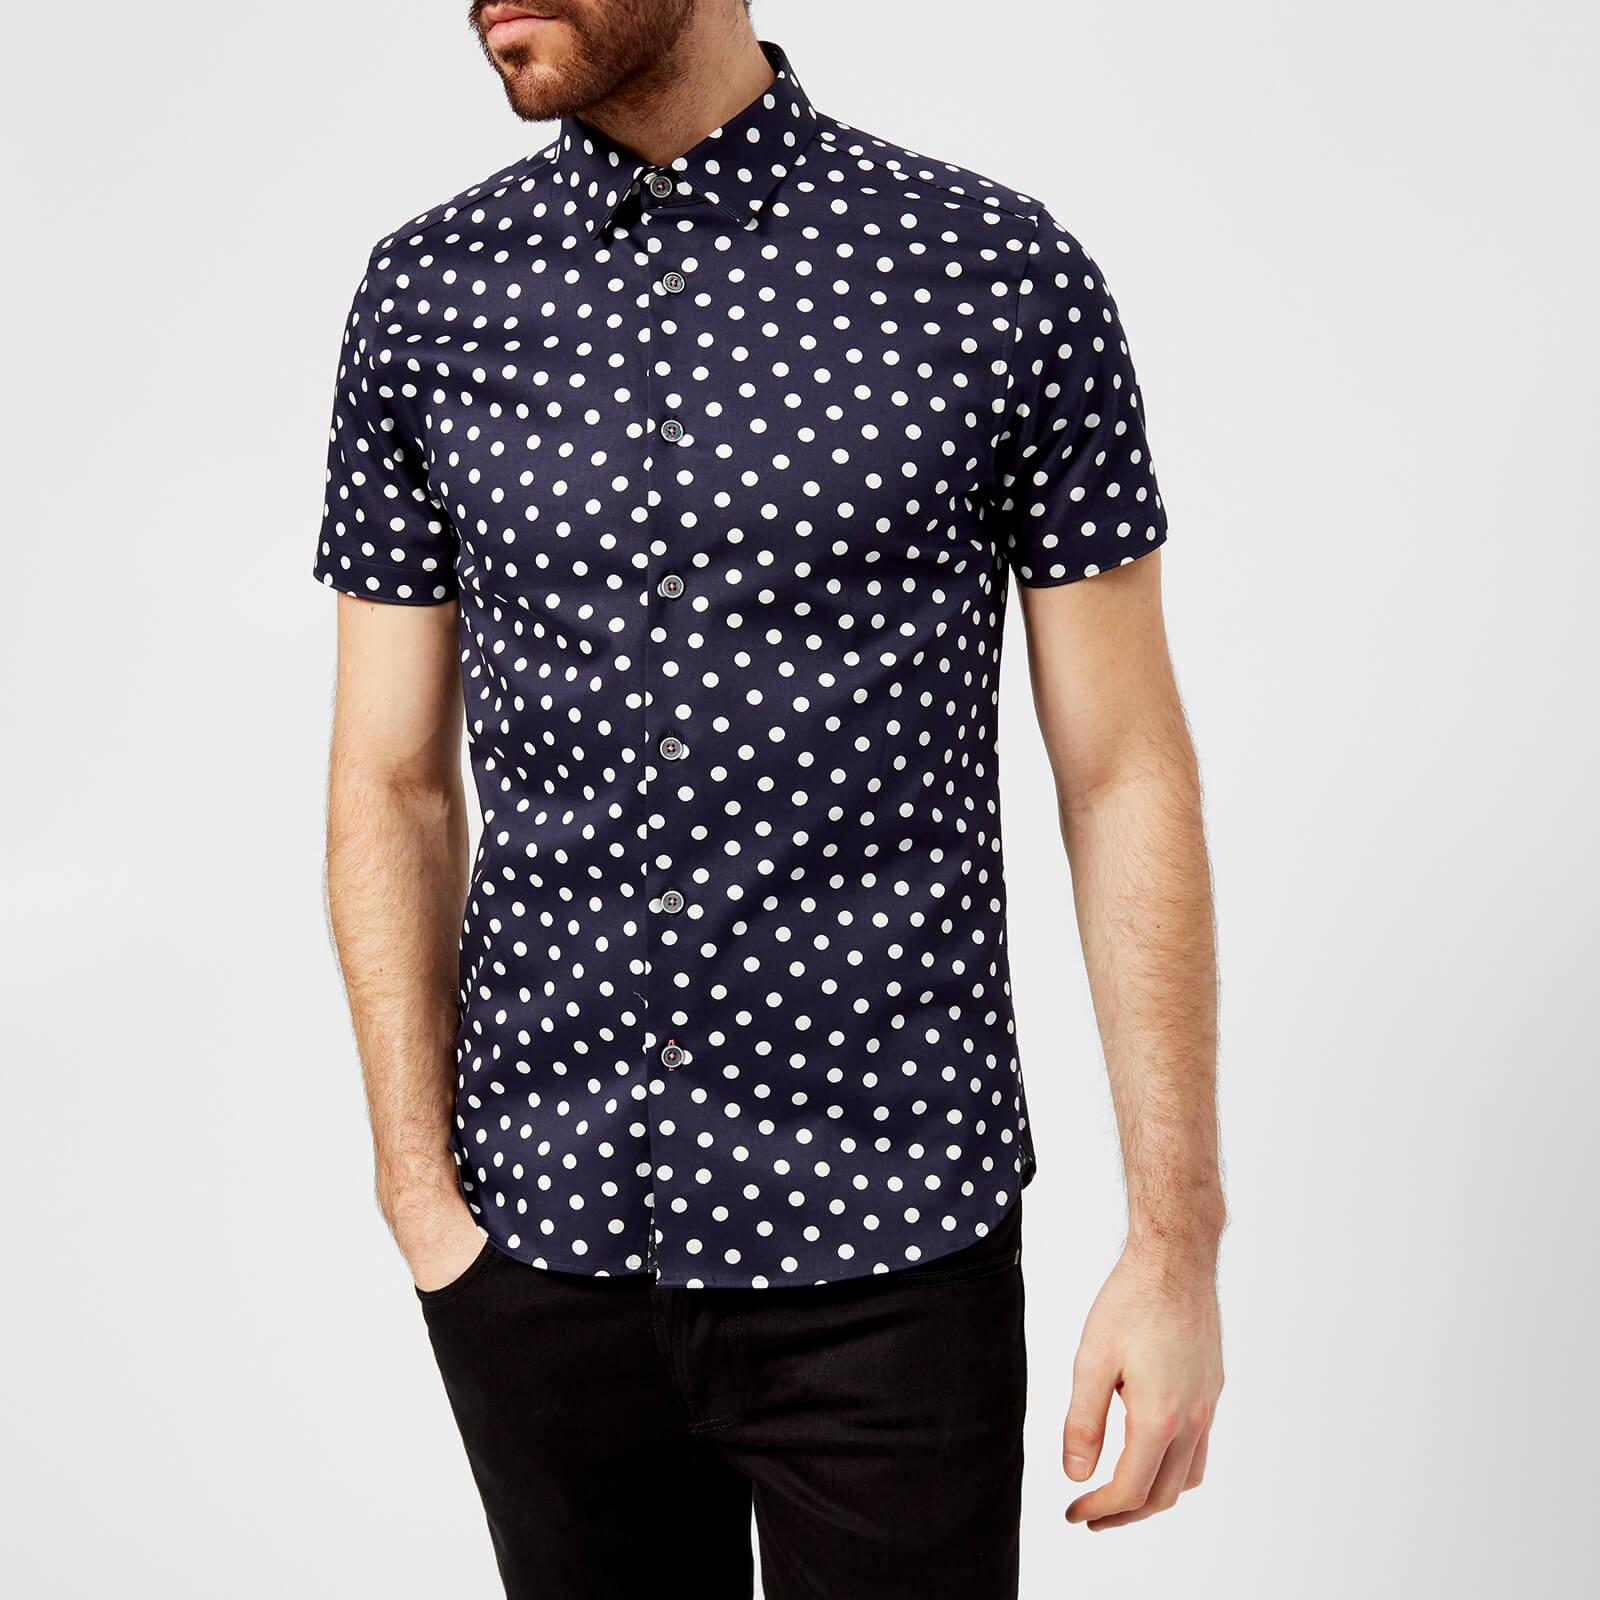 a79aac63d903 Ted Baker Men s Liklak Spot Print Short Sleeve Shirt - Navy Mens Clothing